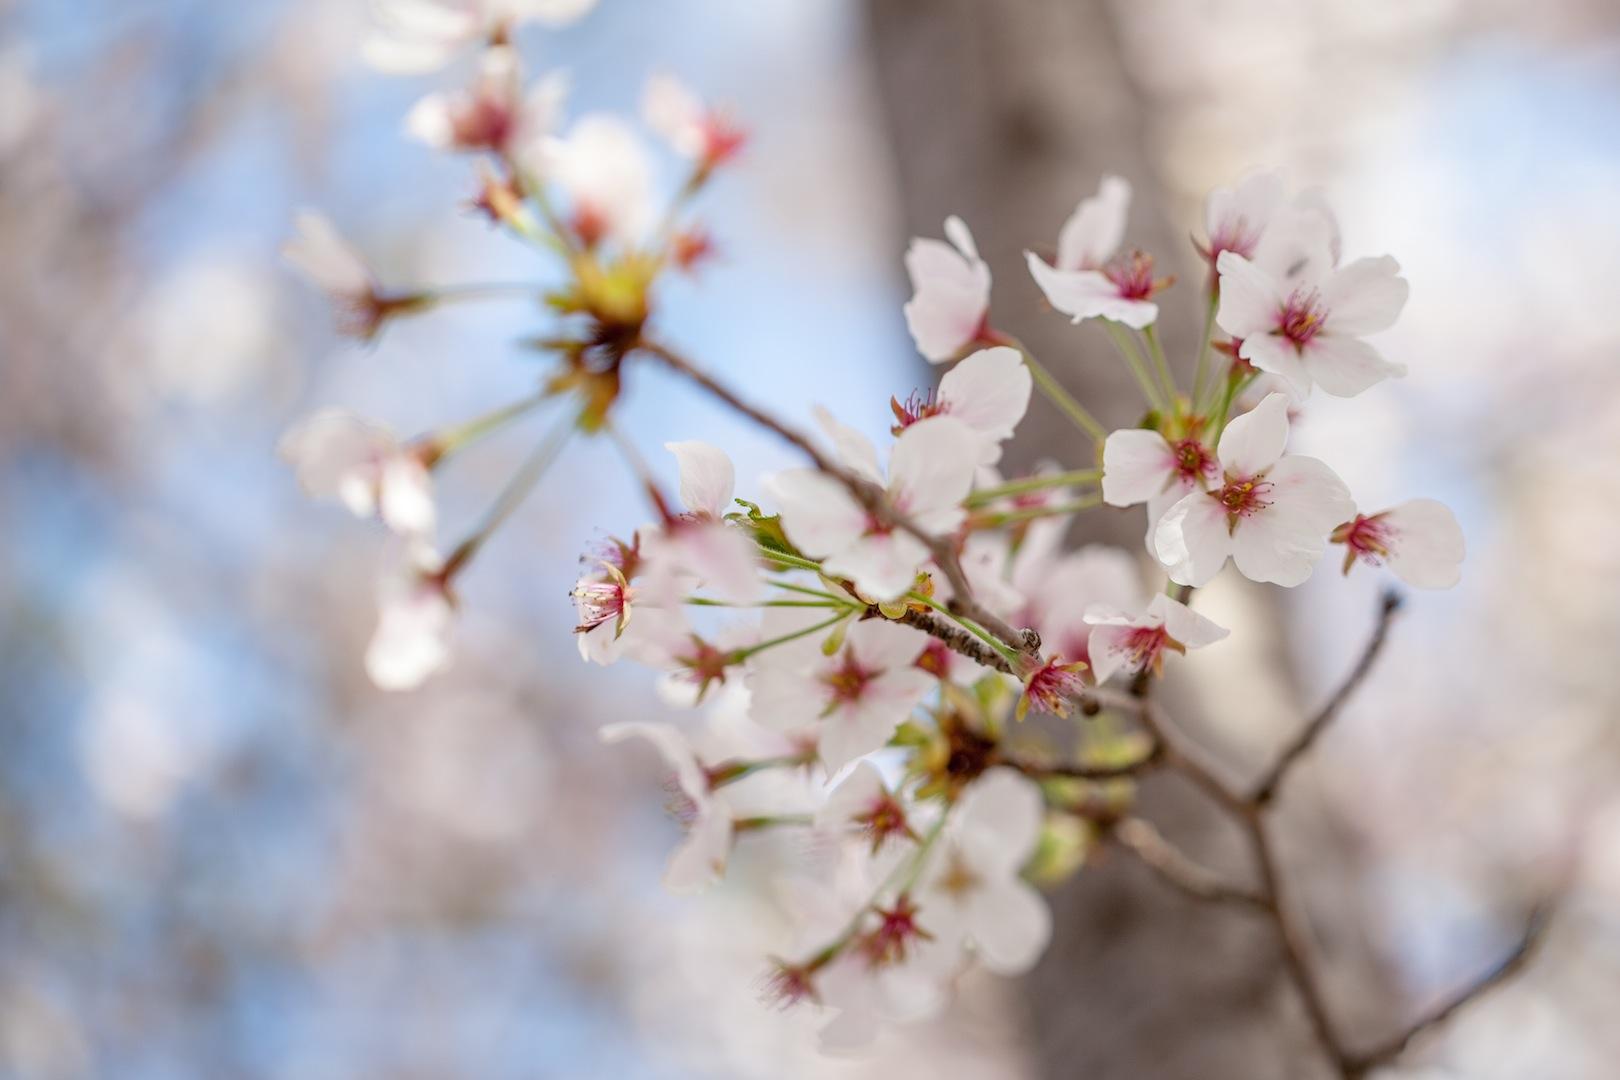 (Cherry Blossom) Springtime in Geoje, South Korea